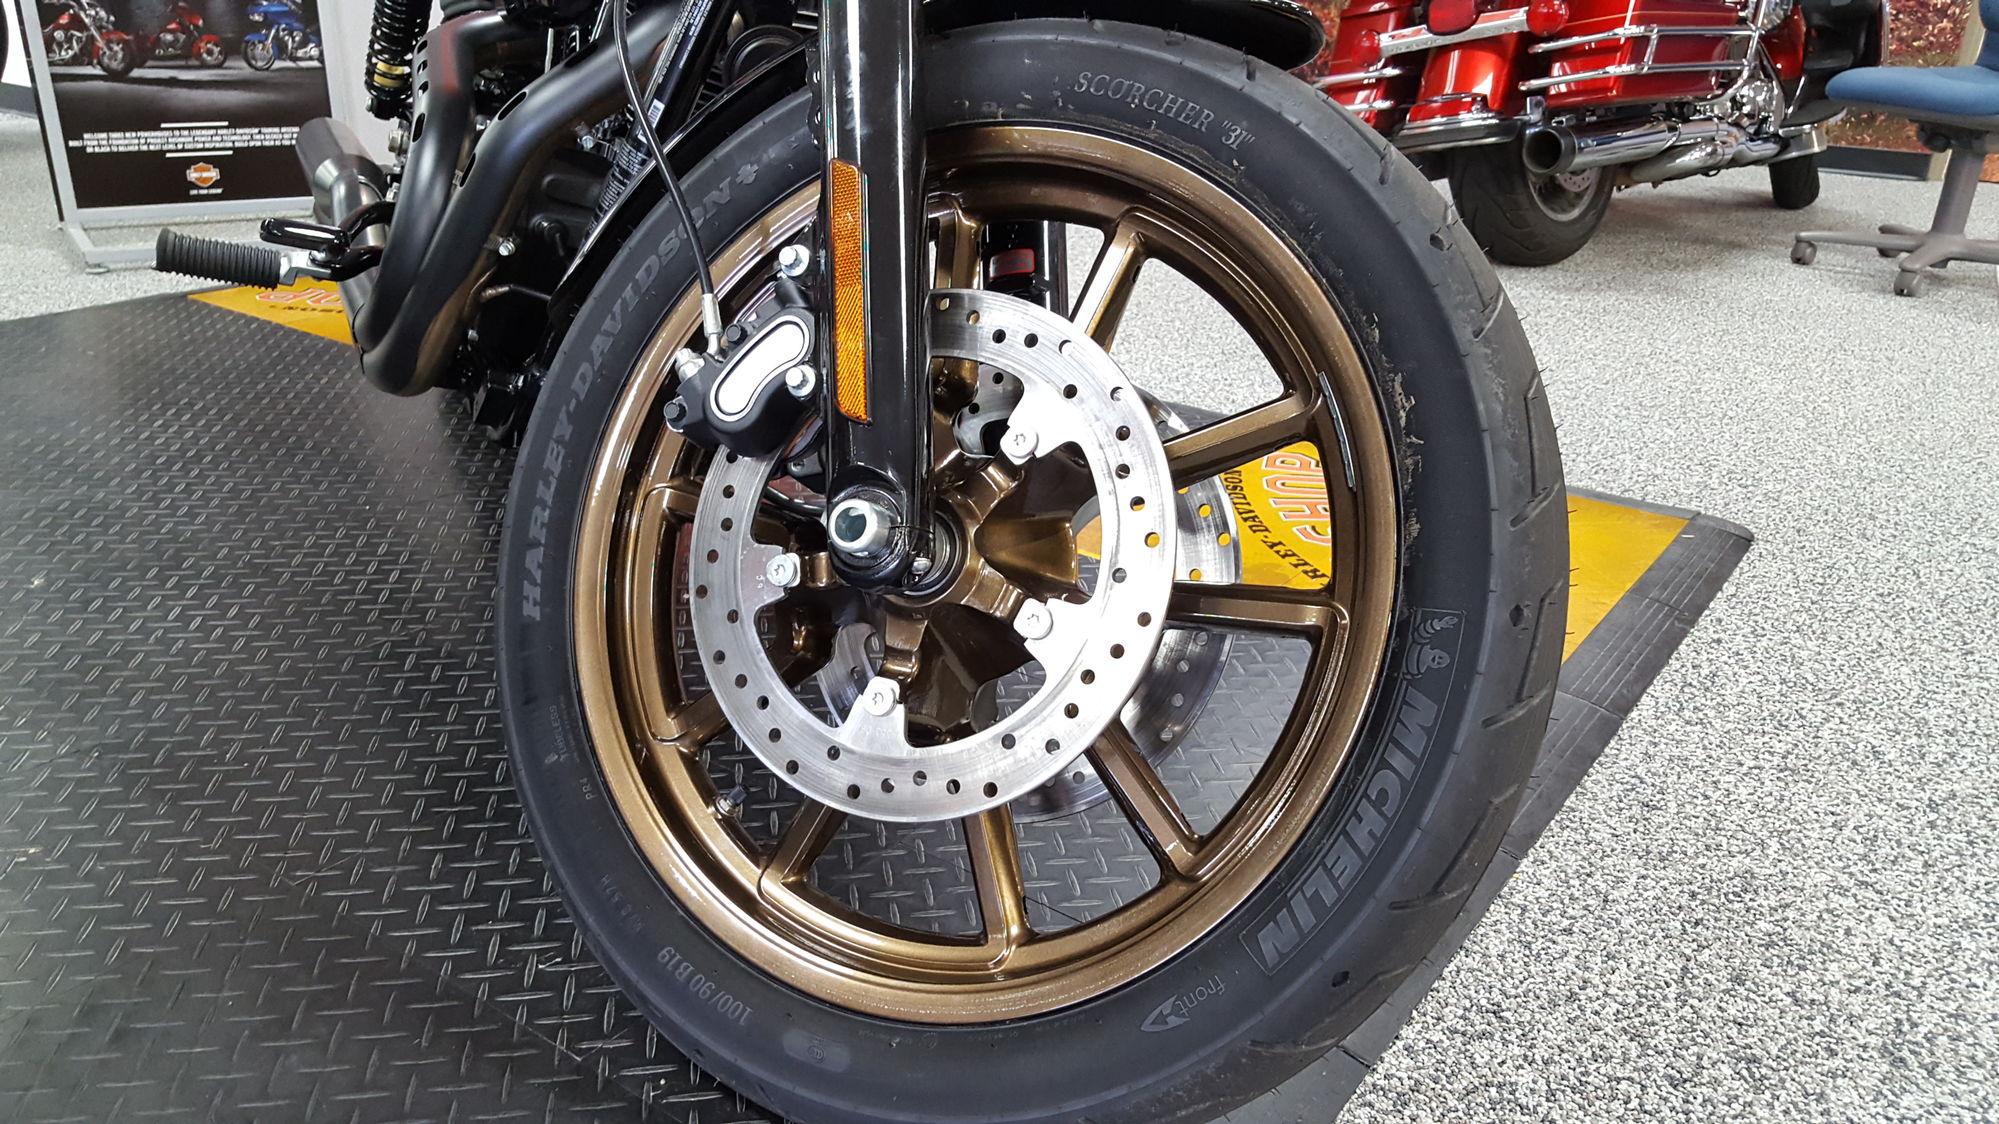 Lowrider S powder coated wheels - Harley Davidson Forums